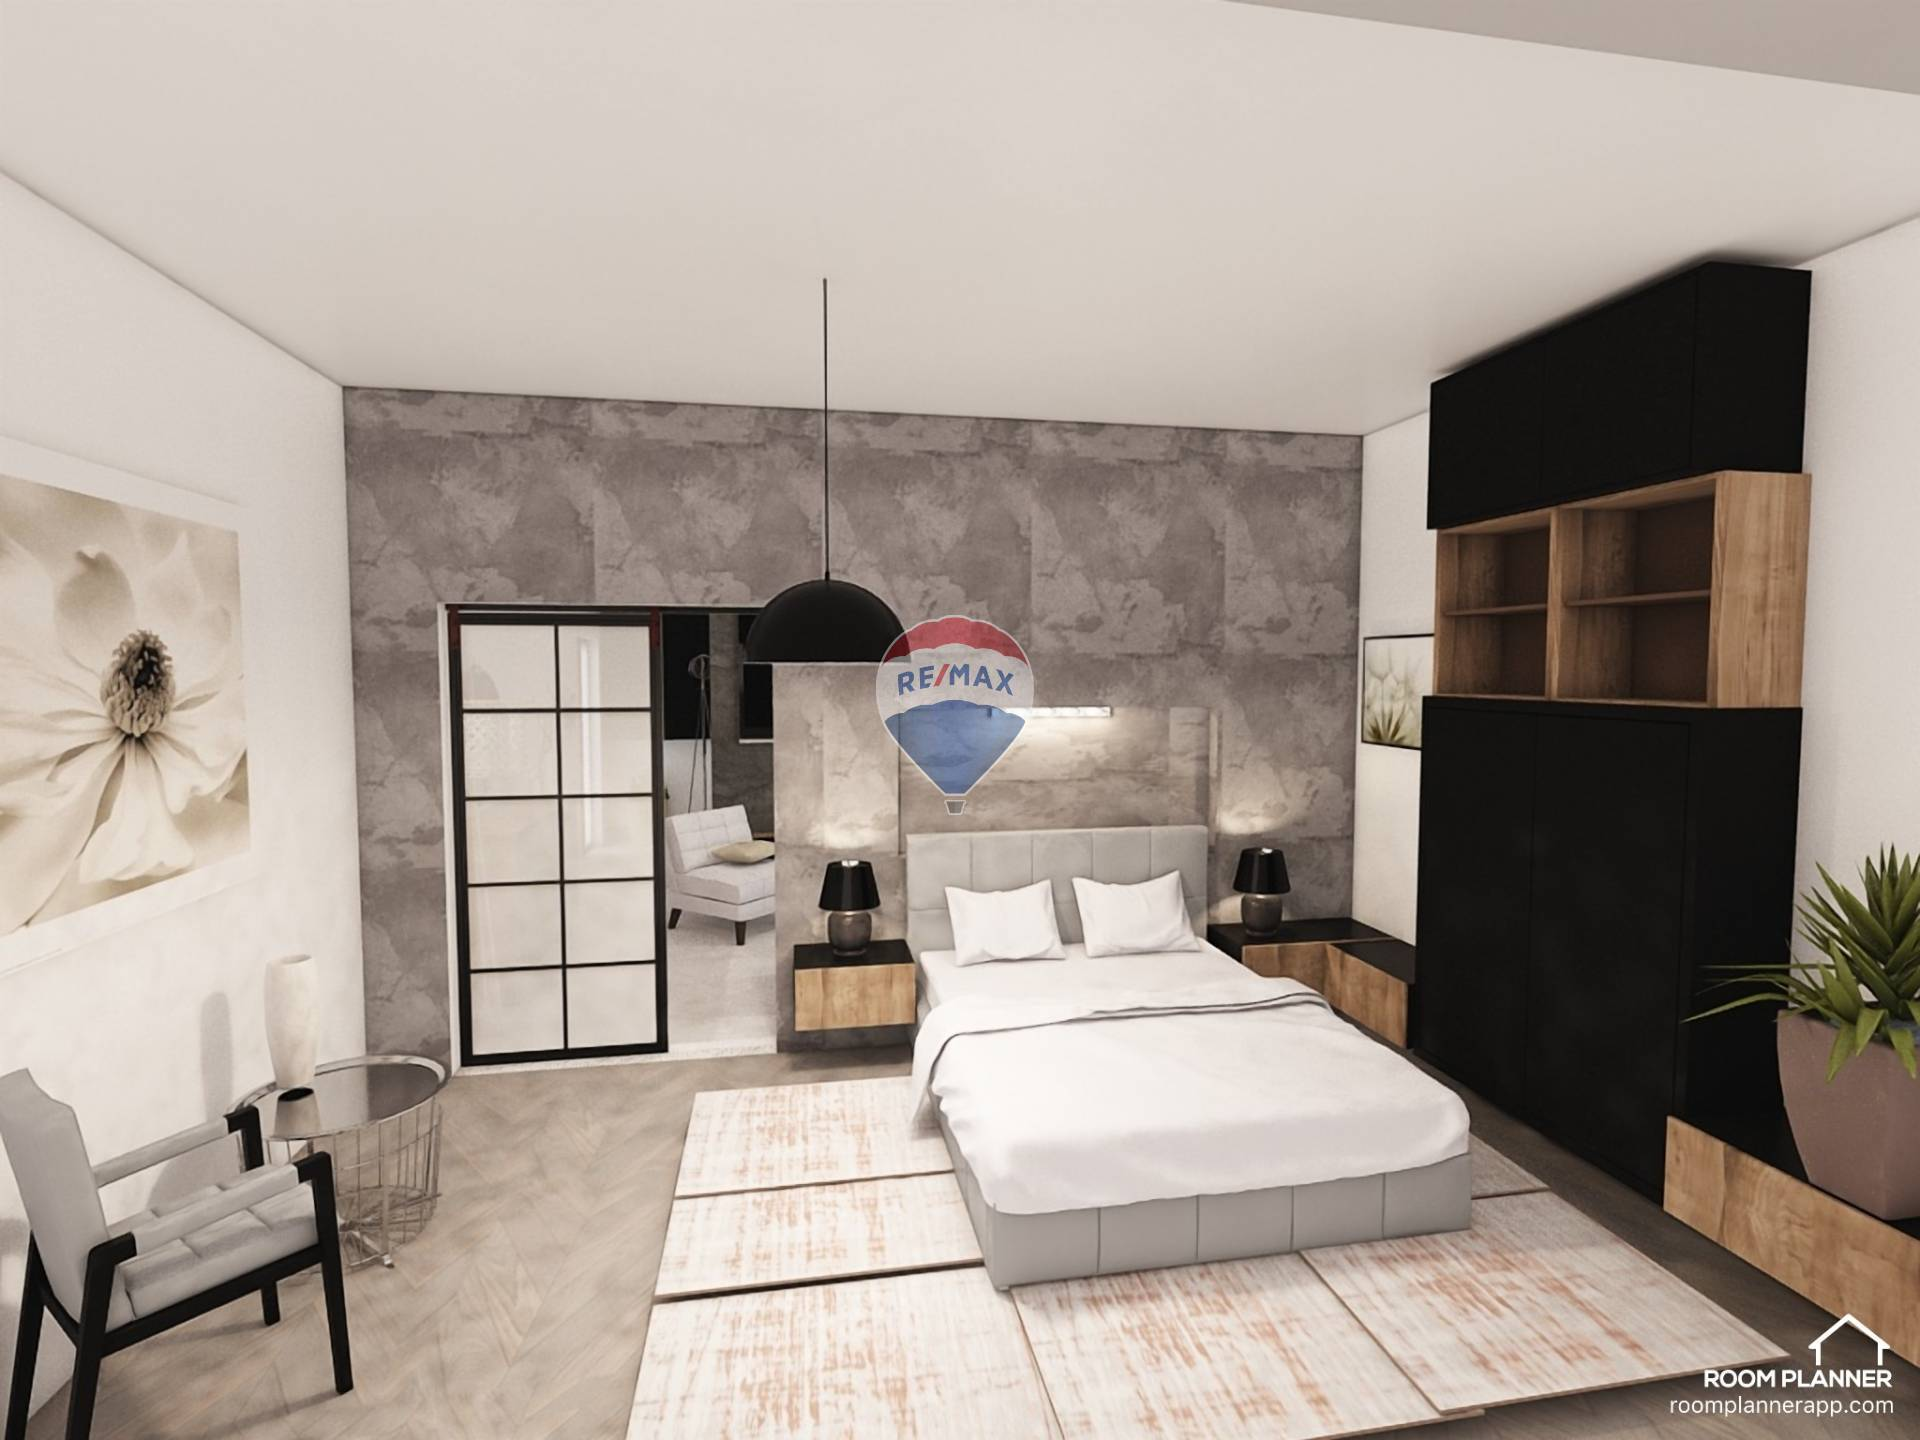 Na PREDAJ 2 izbový byt 48m2 v NOVOSTAVBE, centrum mesta SNV